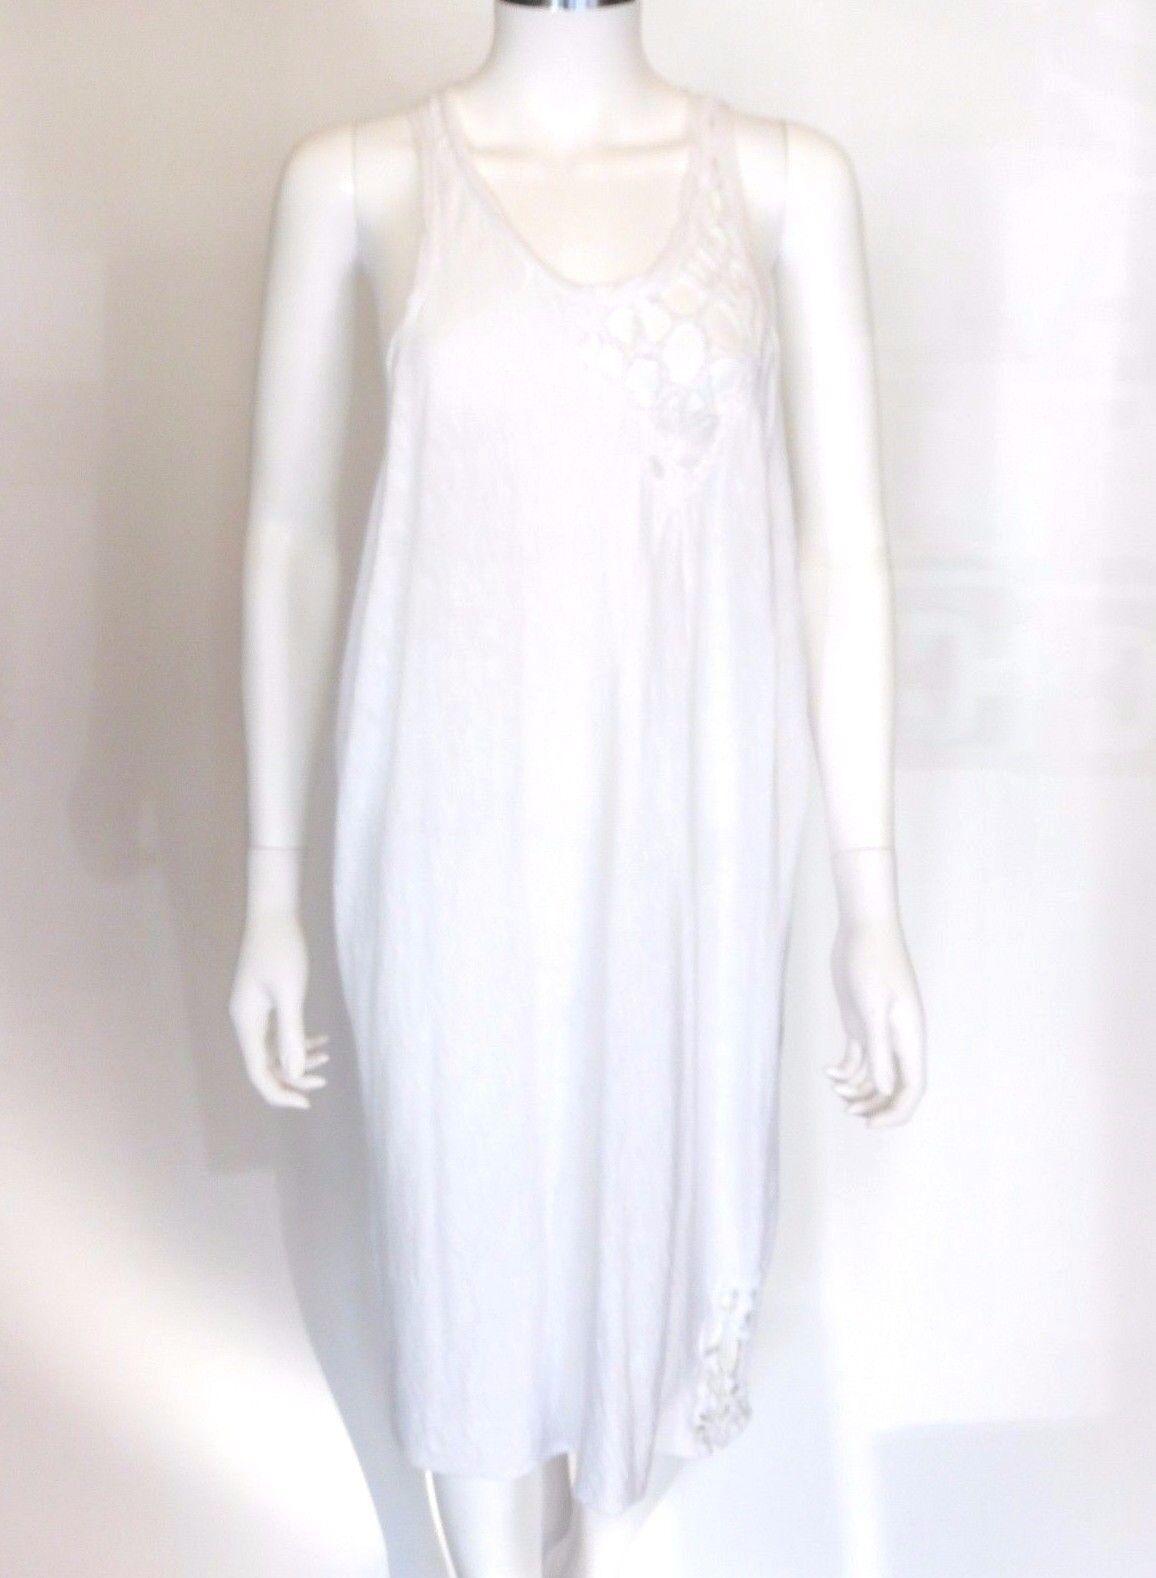 Sandrine Philippe White Tank dress w Cut-Out design Sz 8 Euro 40 Retail